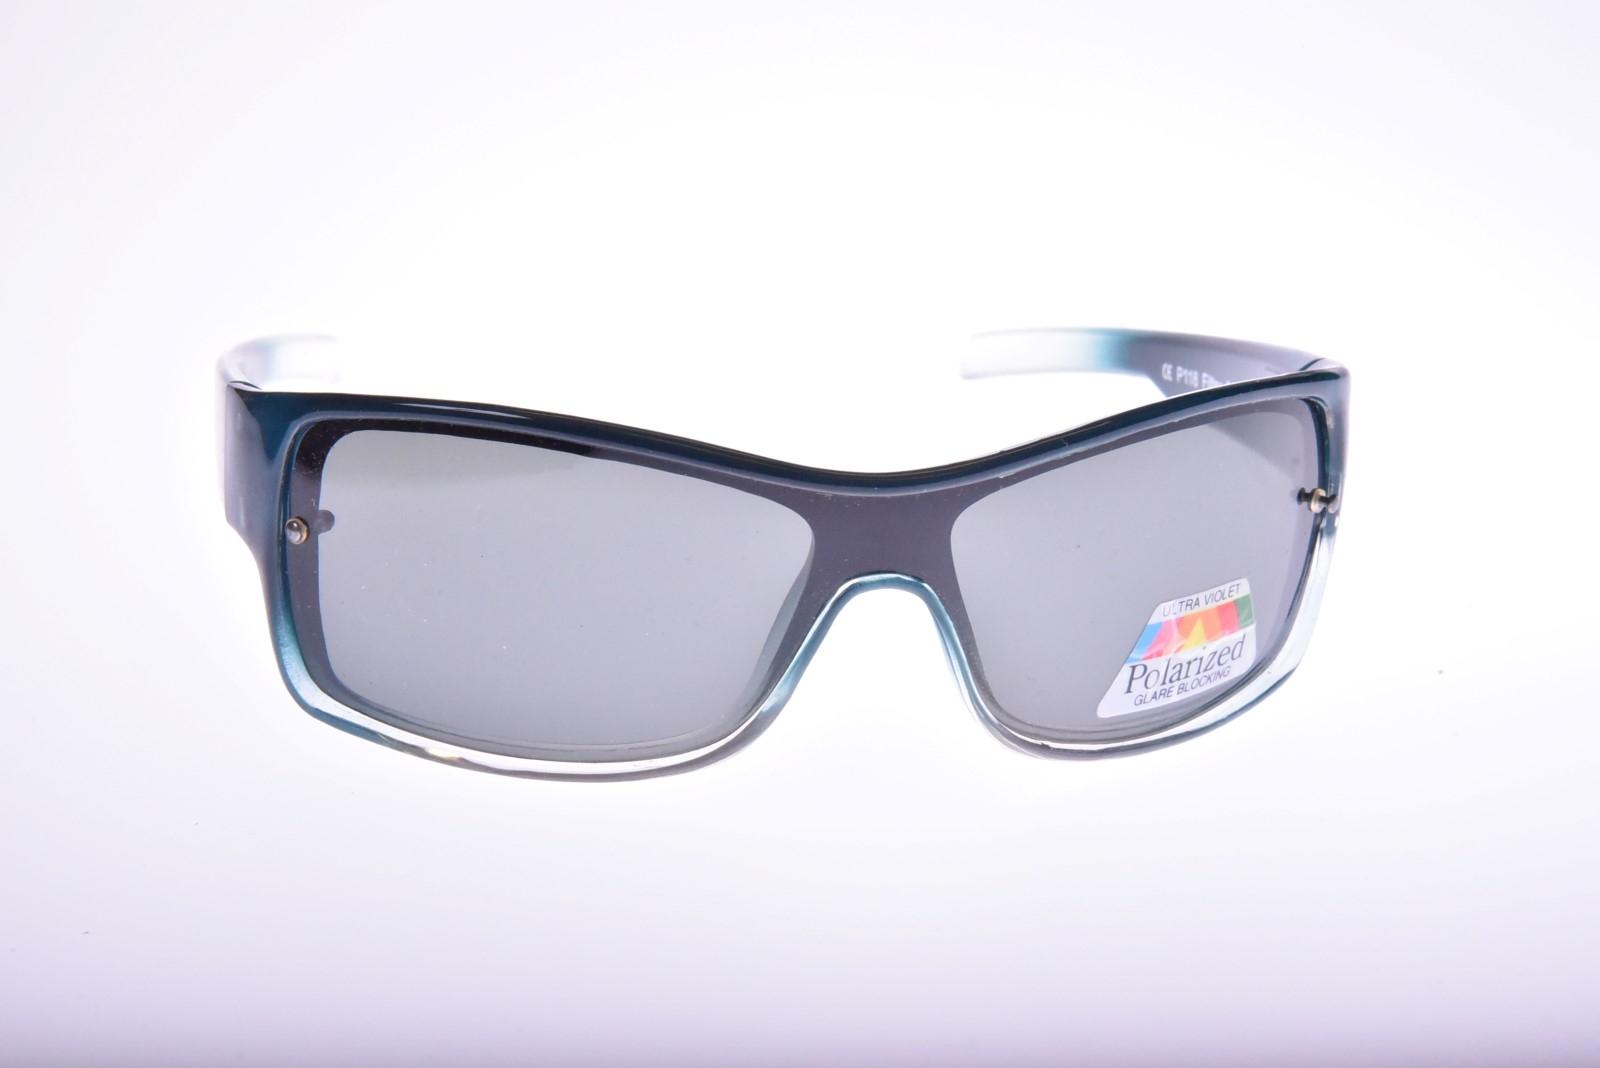 Extreme Core P118 - Unisex slnečné okuliare